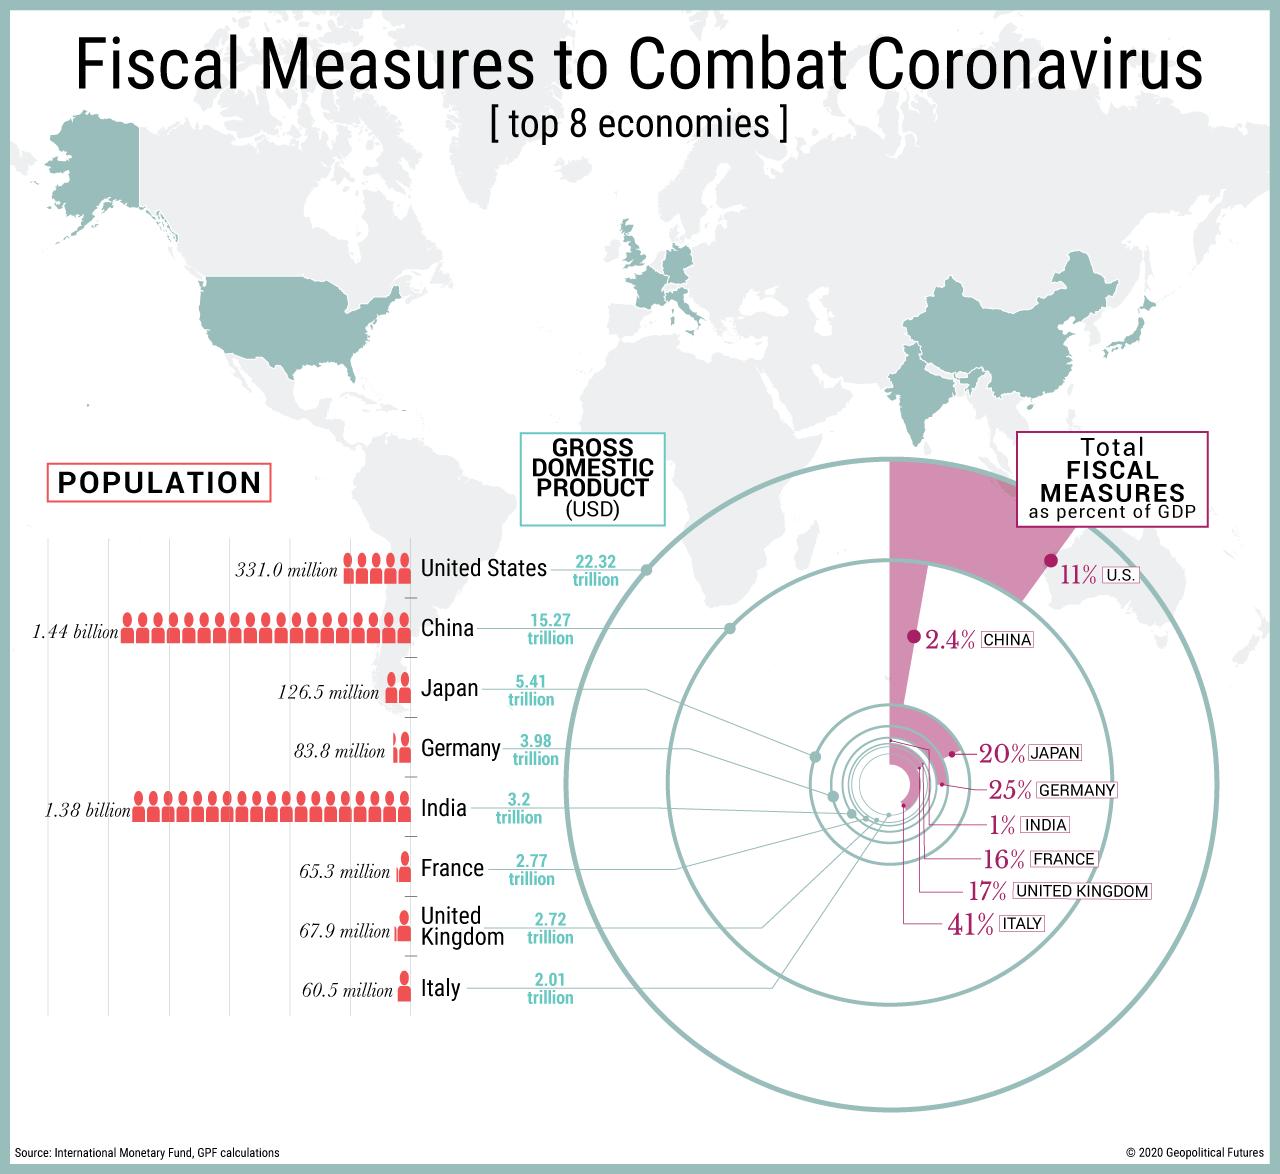 Fiscal Measures to Combat Coronavirus